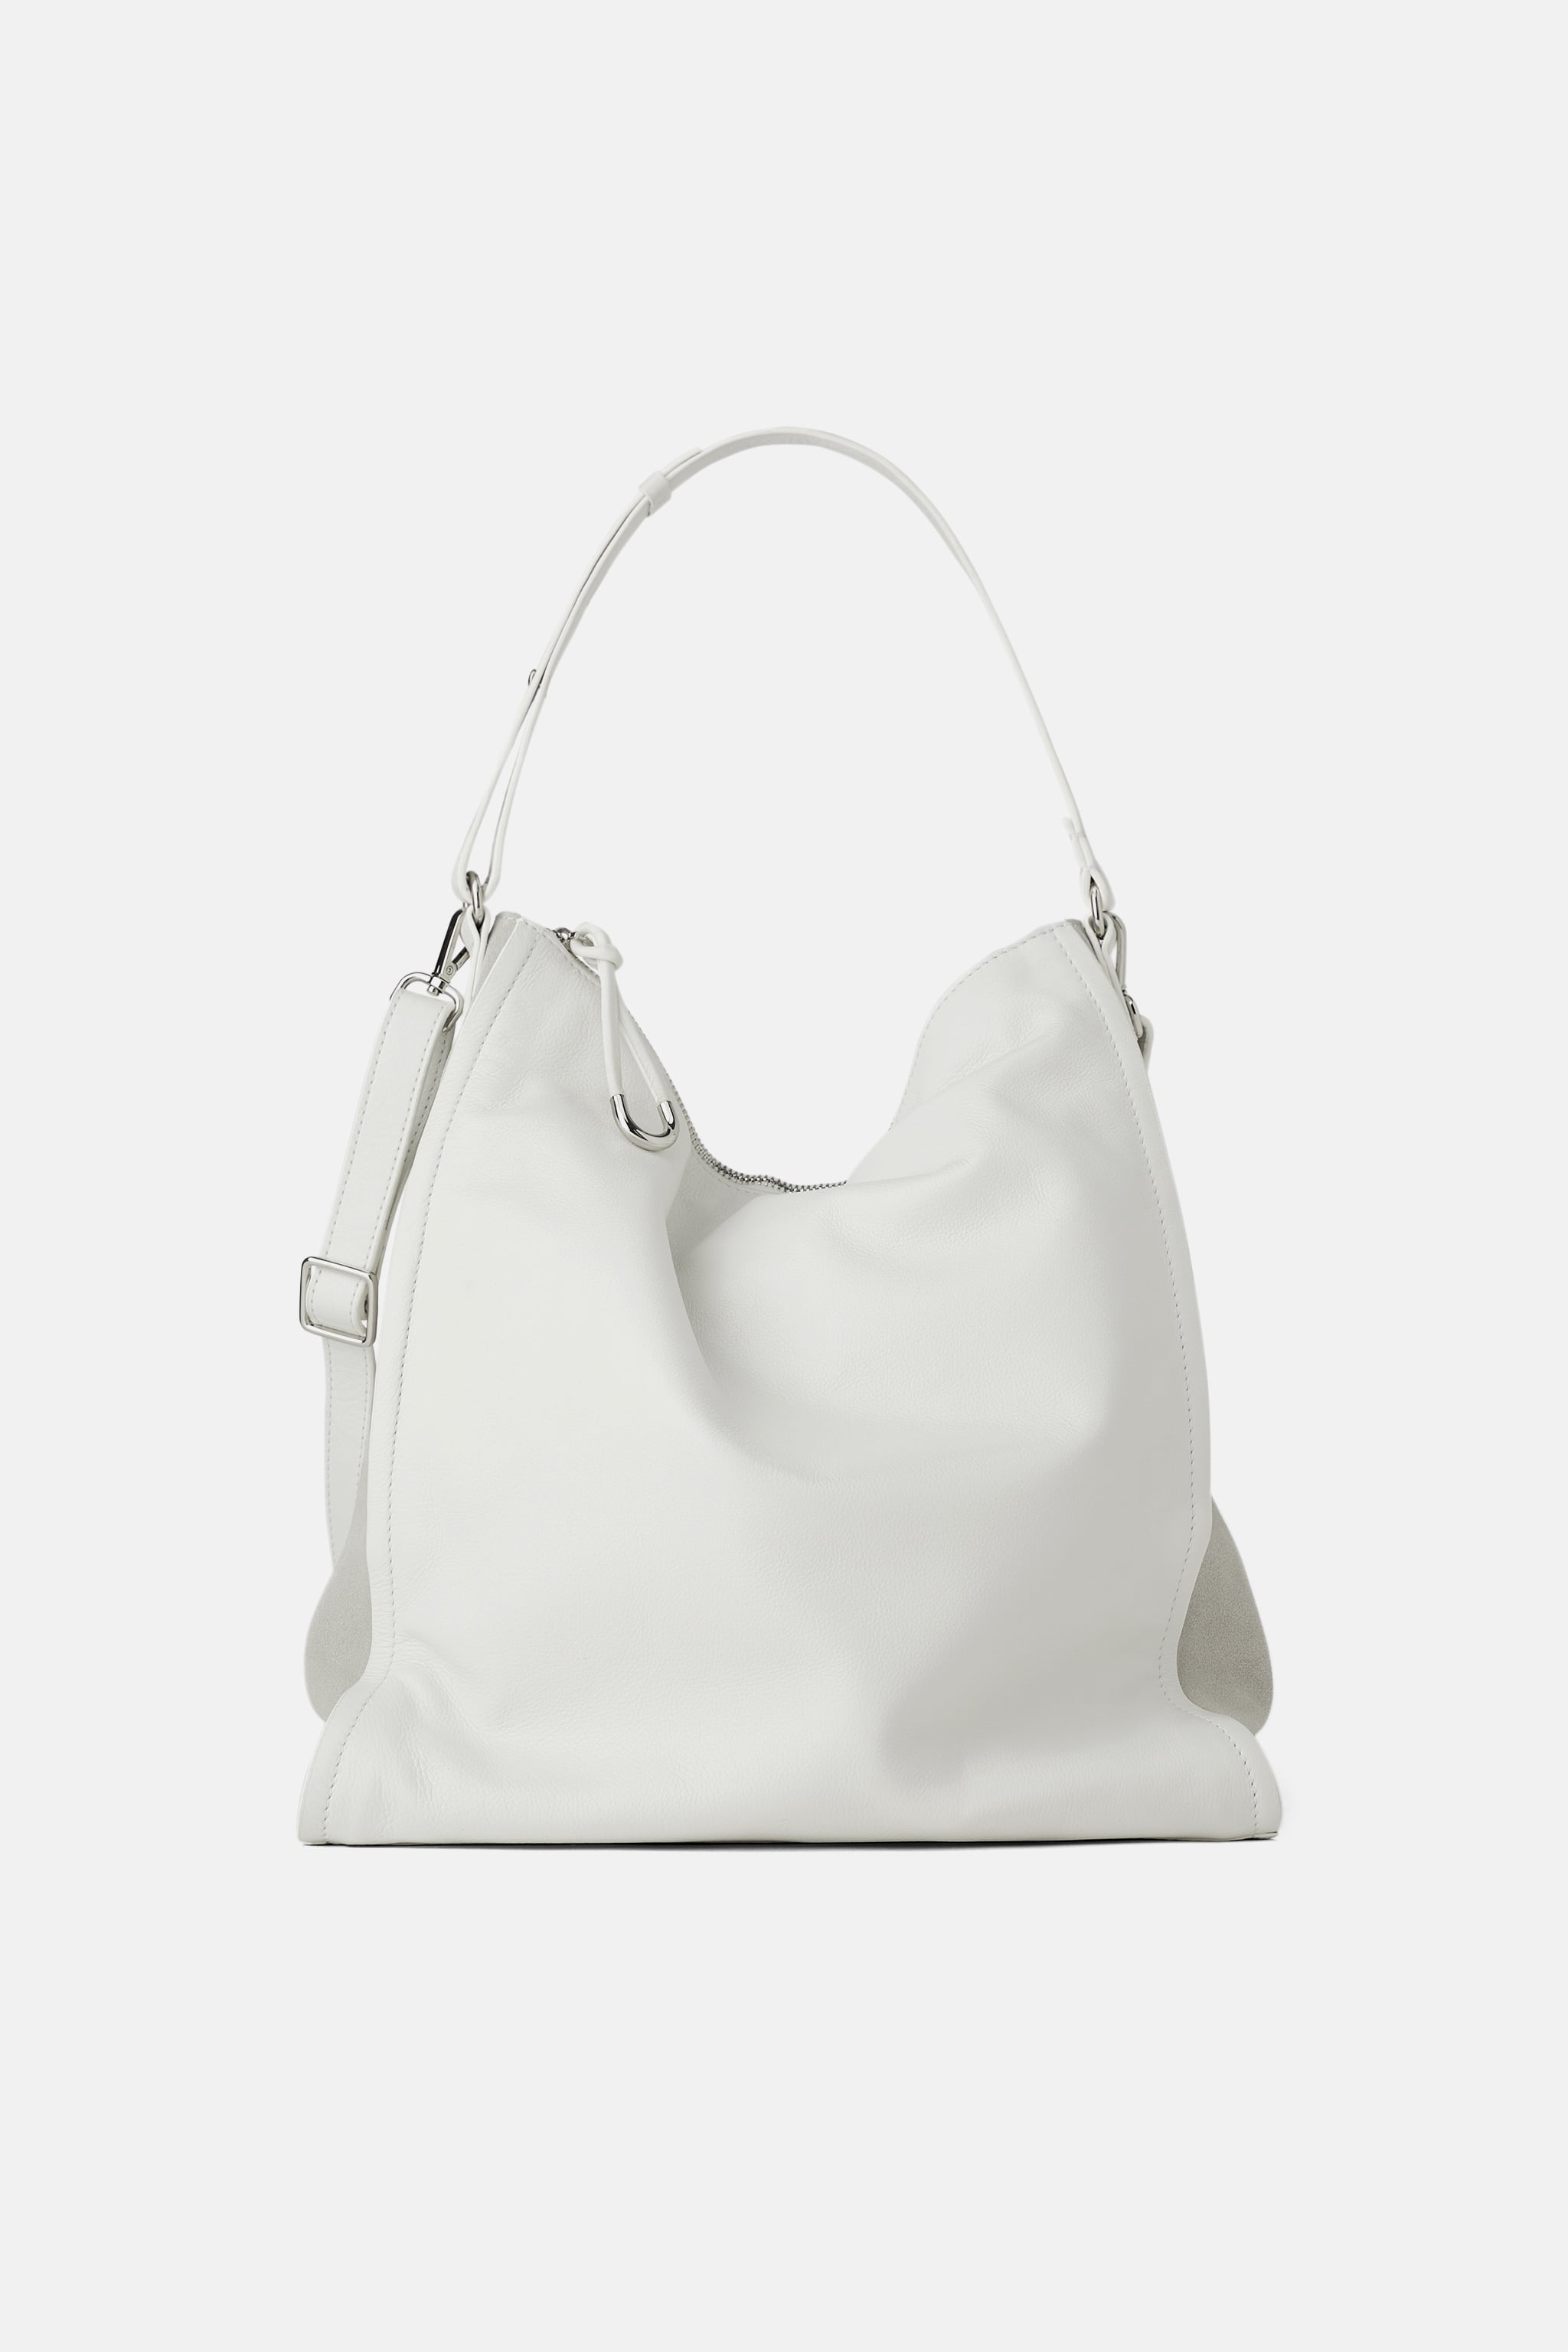 f18e4c9f51 Zara TUMBLED SOFT LEATHER BUCKET BAG